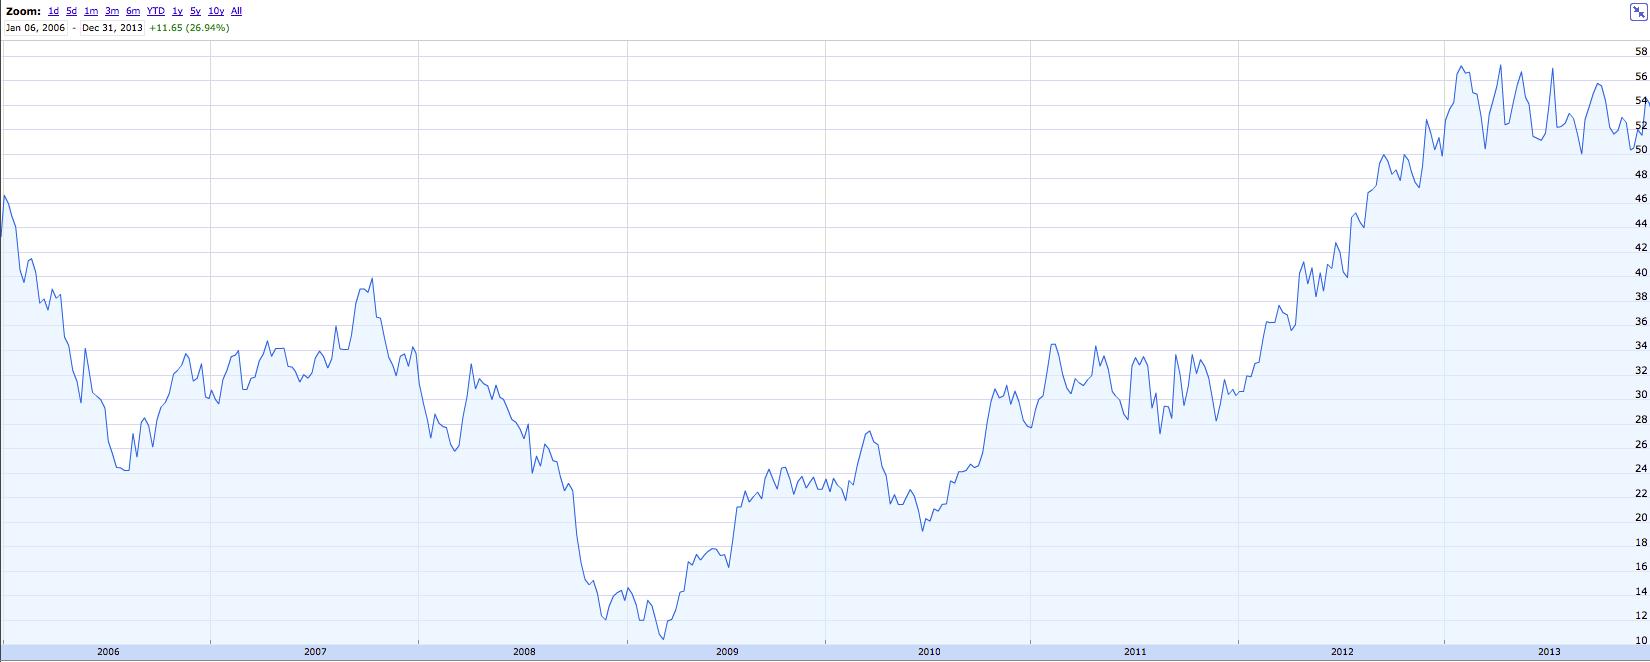 eBay 8 year chart